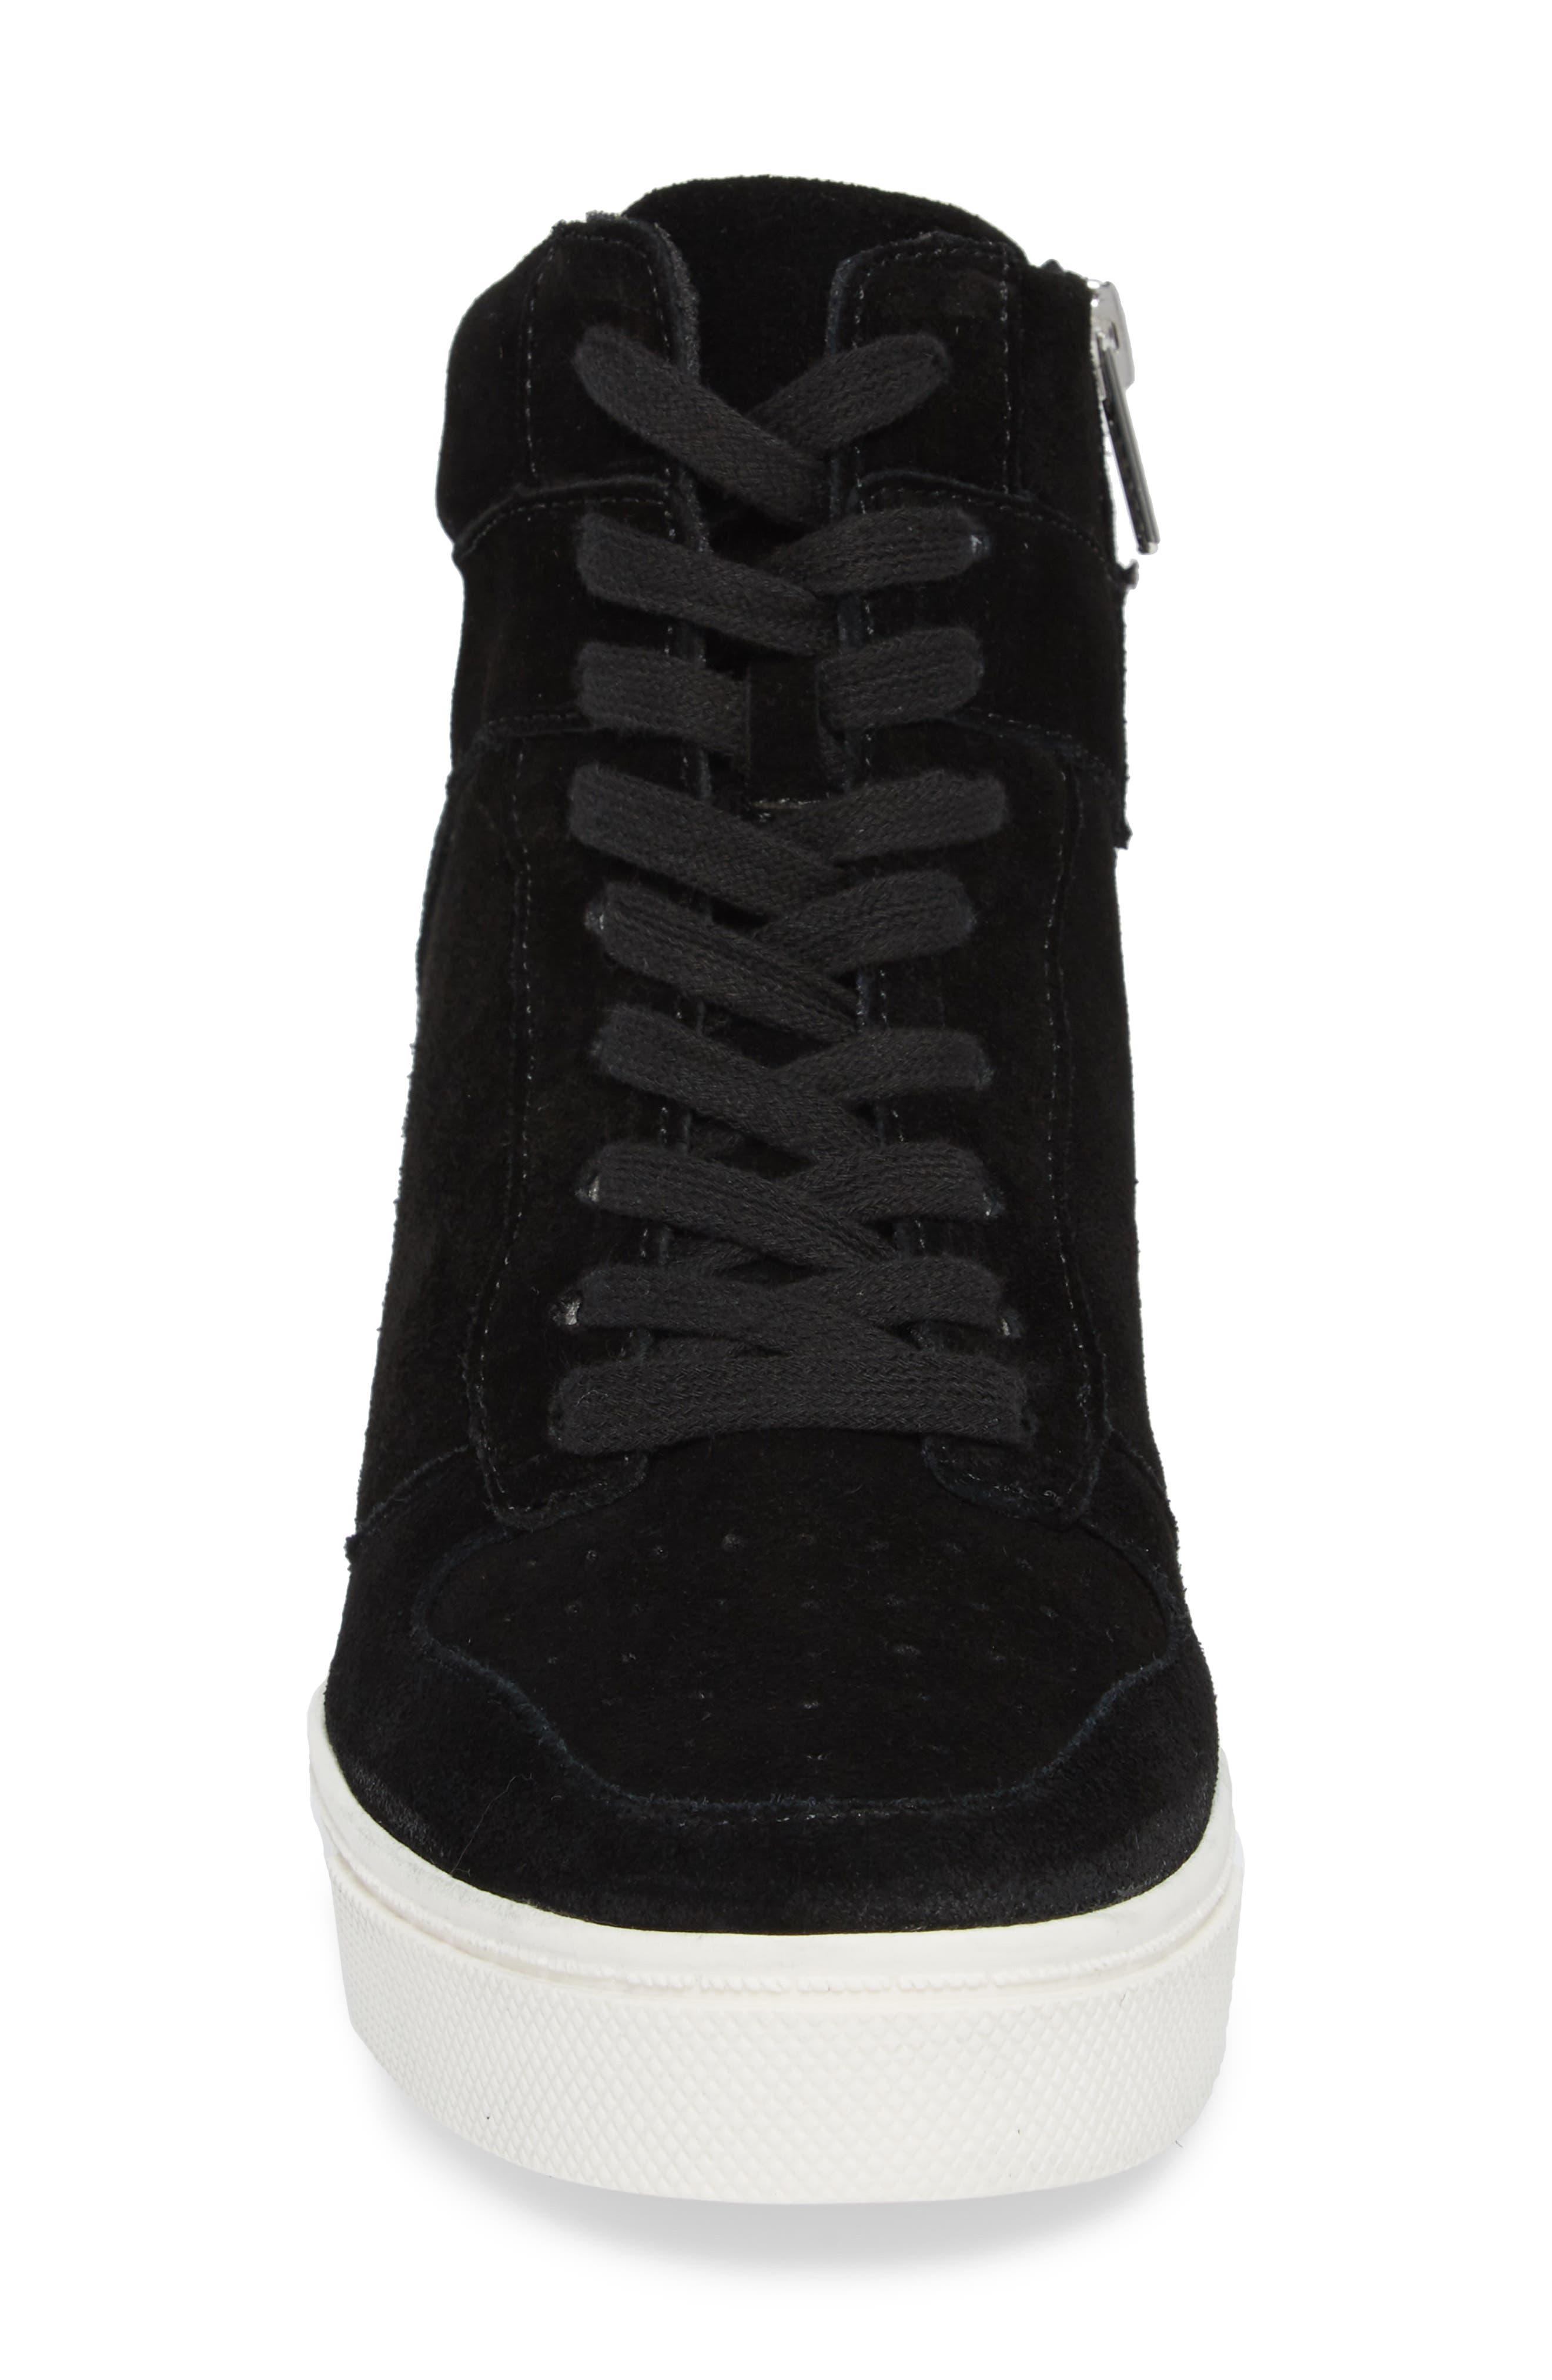 Noah Hidden Wedge Sneaker,                             Alternate thumbnail 4, color,                             006